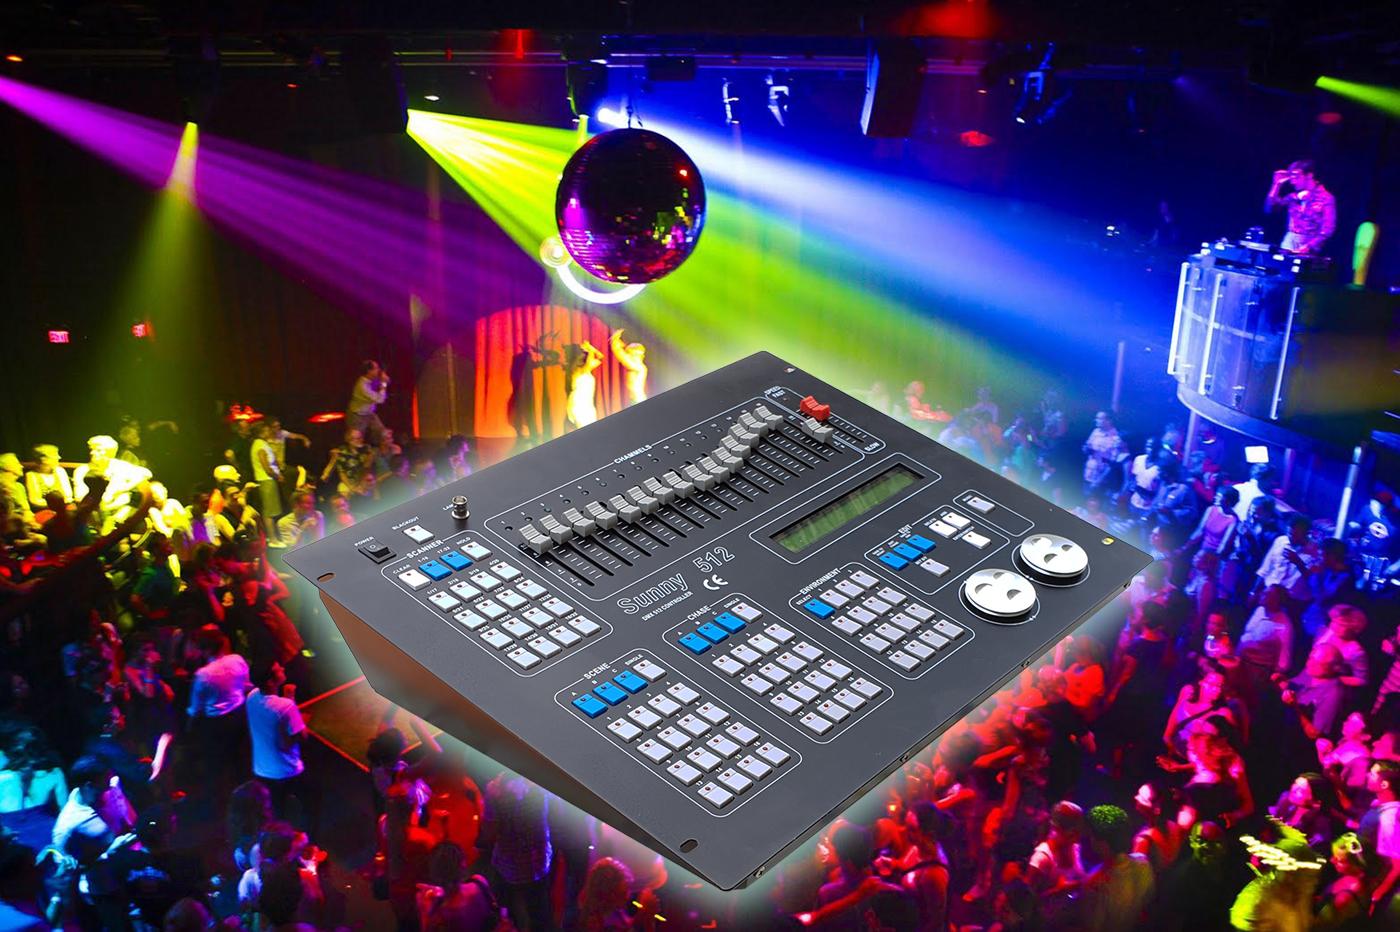 Bes 24471 feste e party beselettronica controller dmx 512